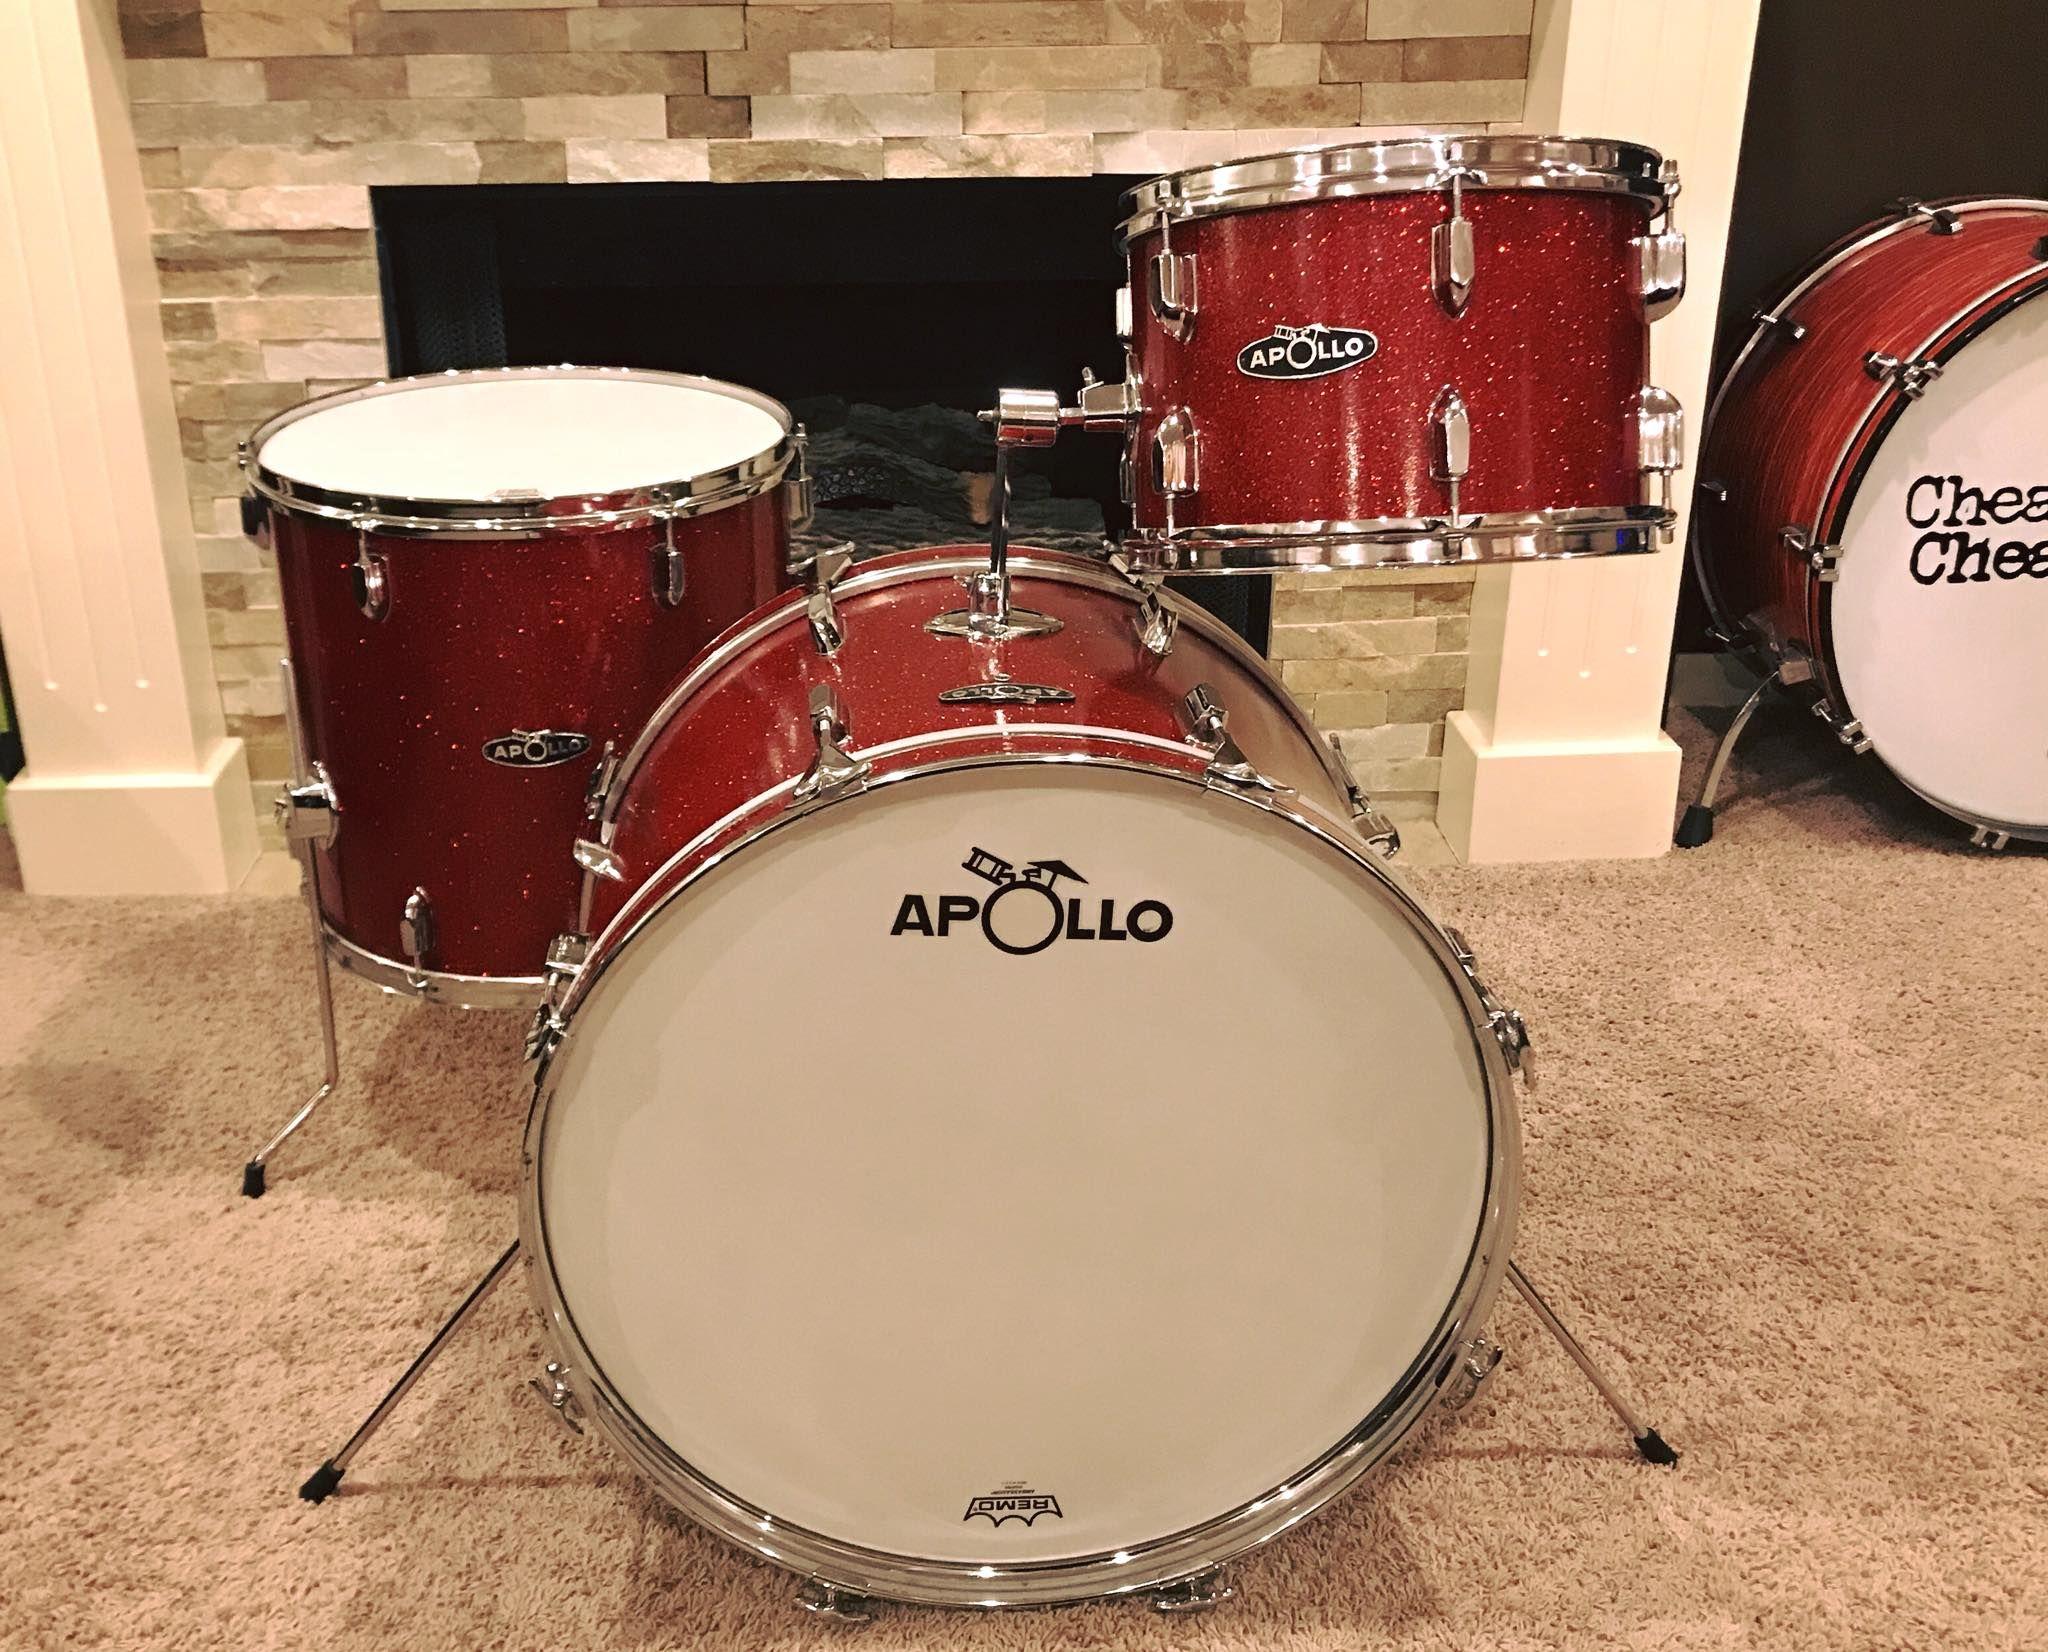 Dating Vintage Yamaha drums